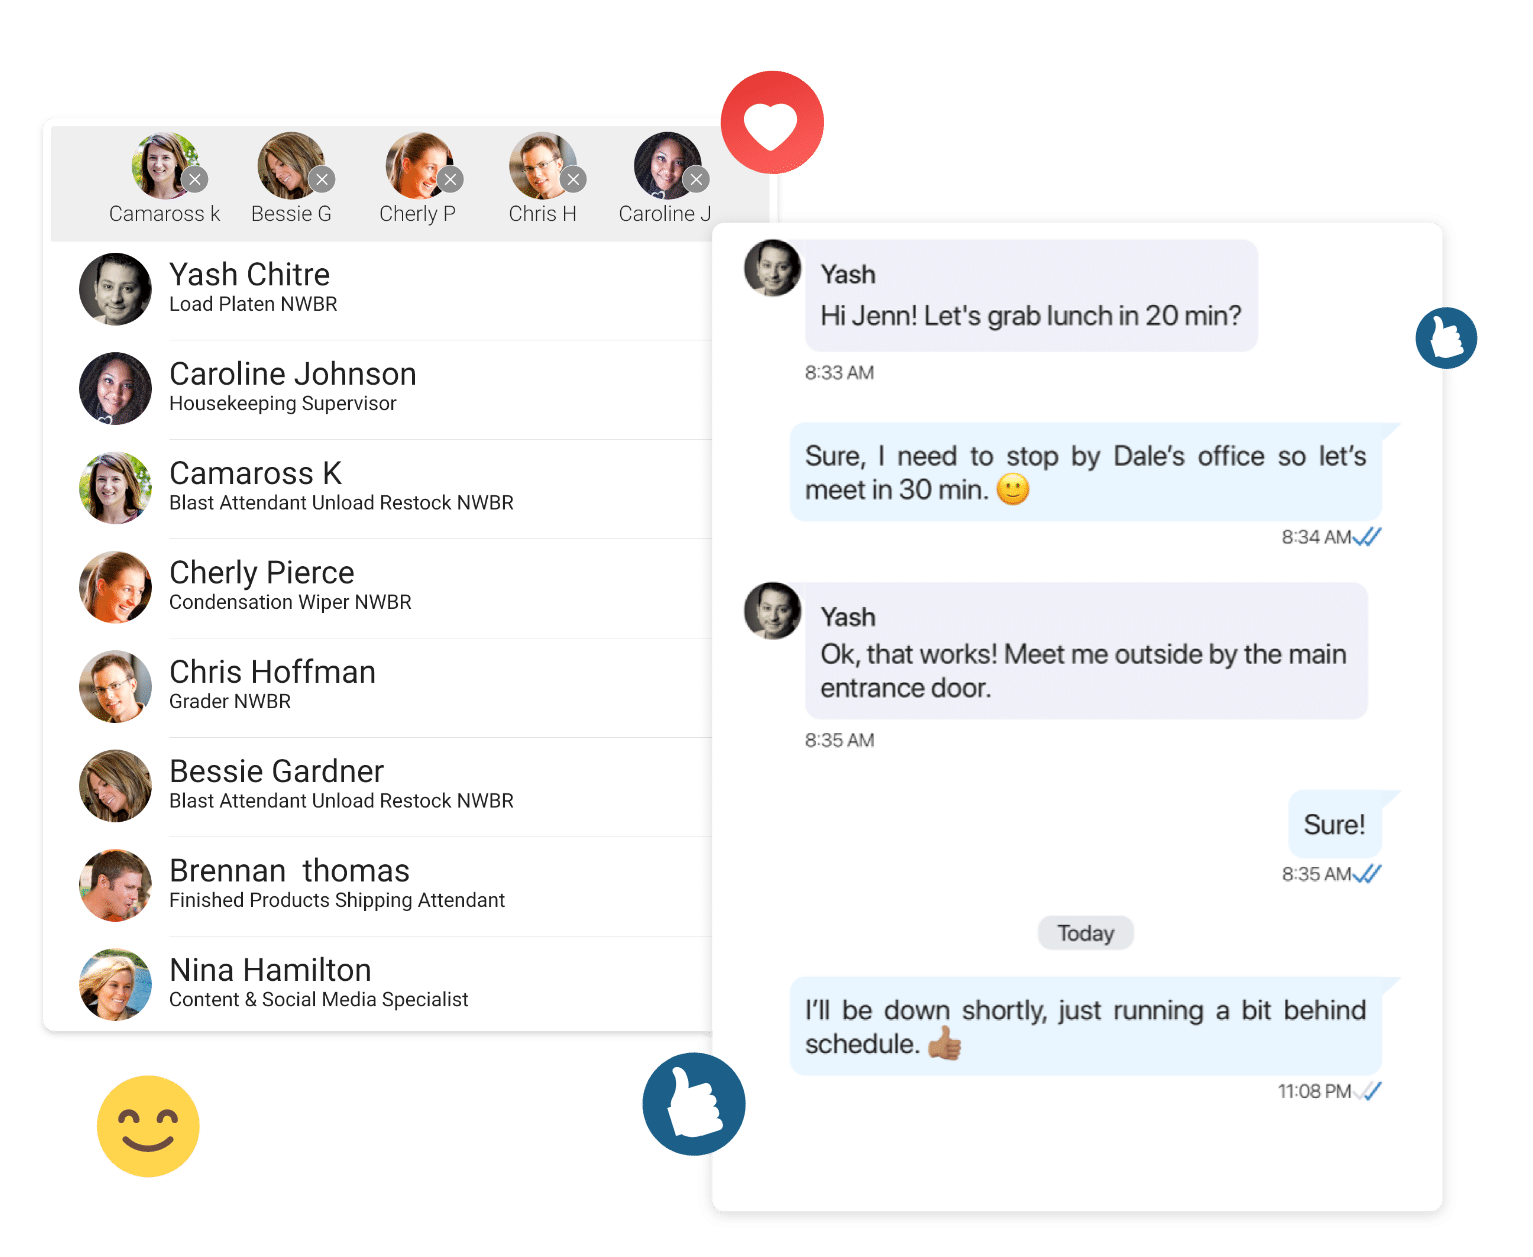 Enterprise-grade instant messaging